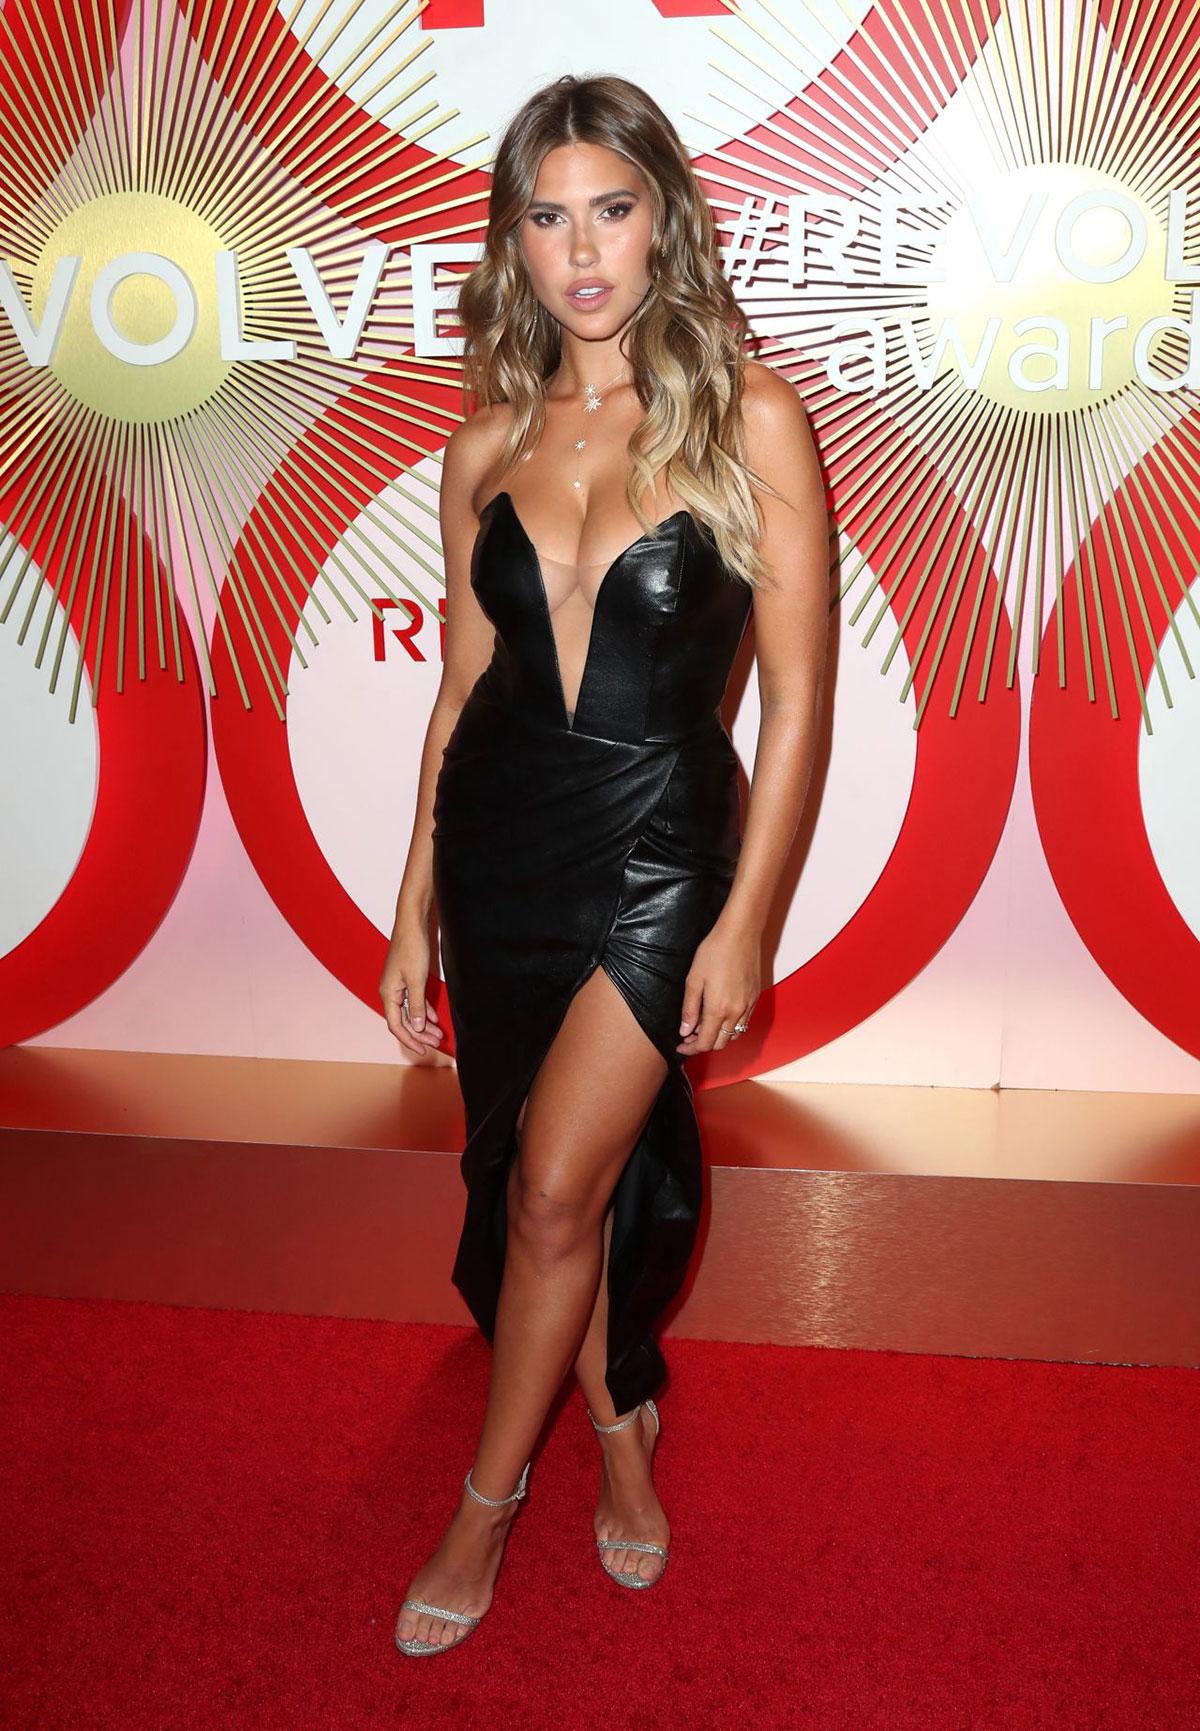 Celebrity News, Style, and Gossip - Cosmopolitan